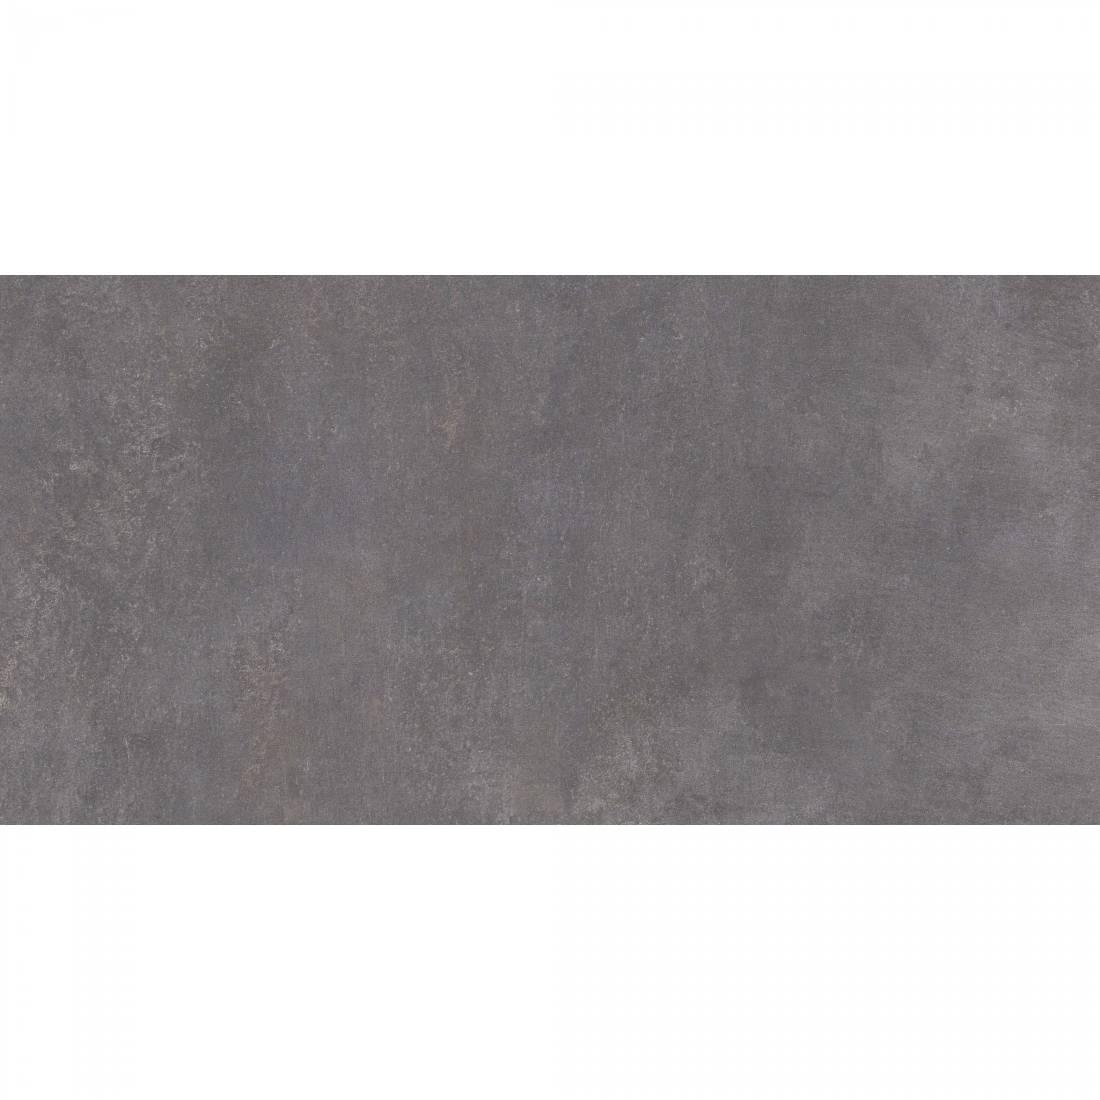 Metropoli 40x80 Dark Grafito 1